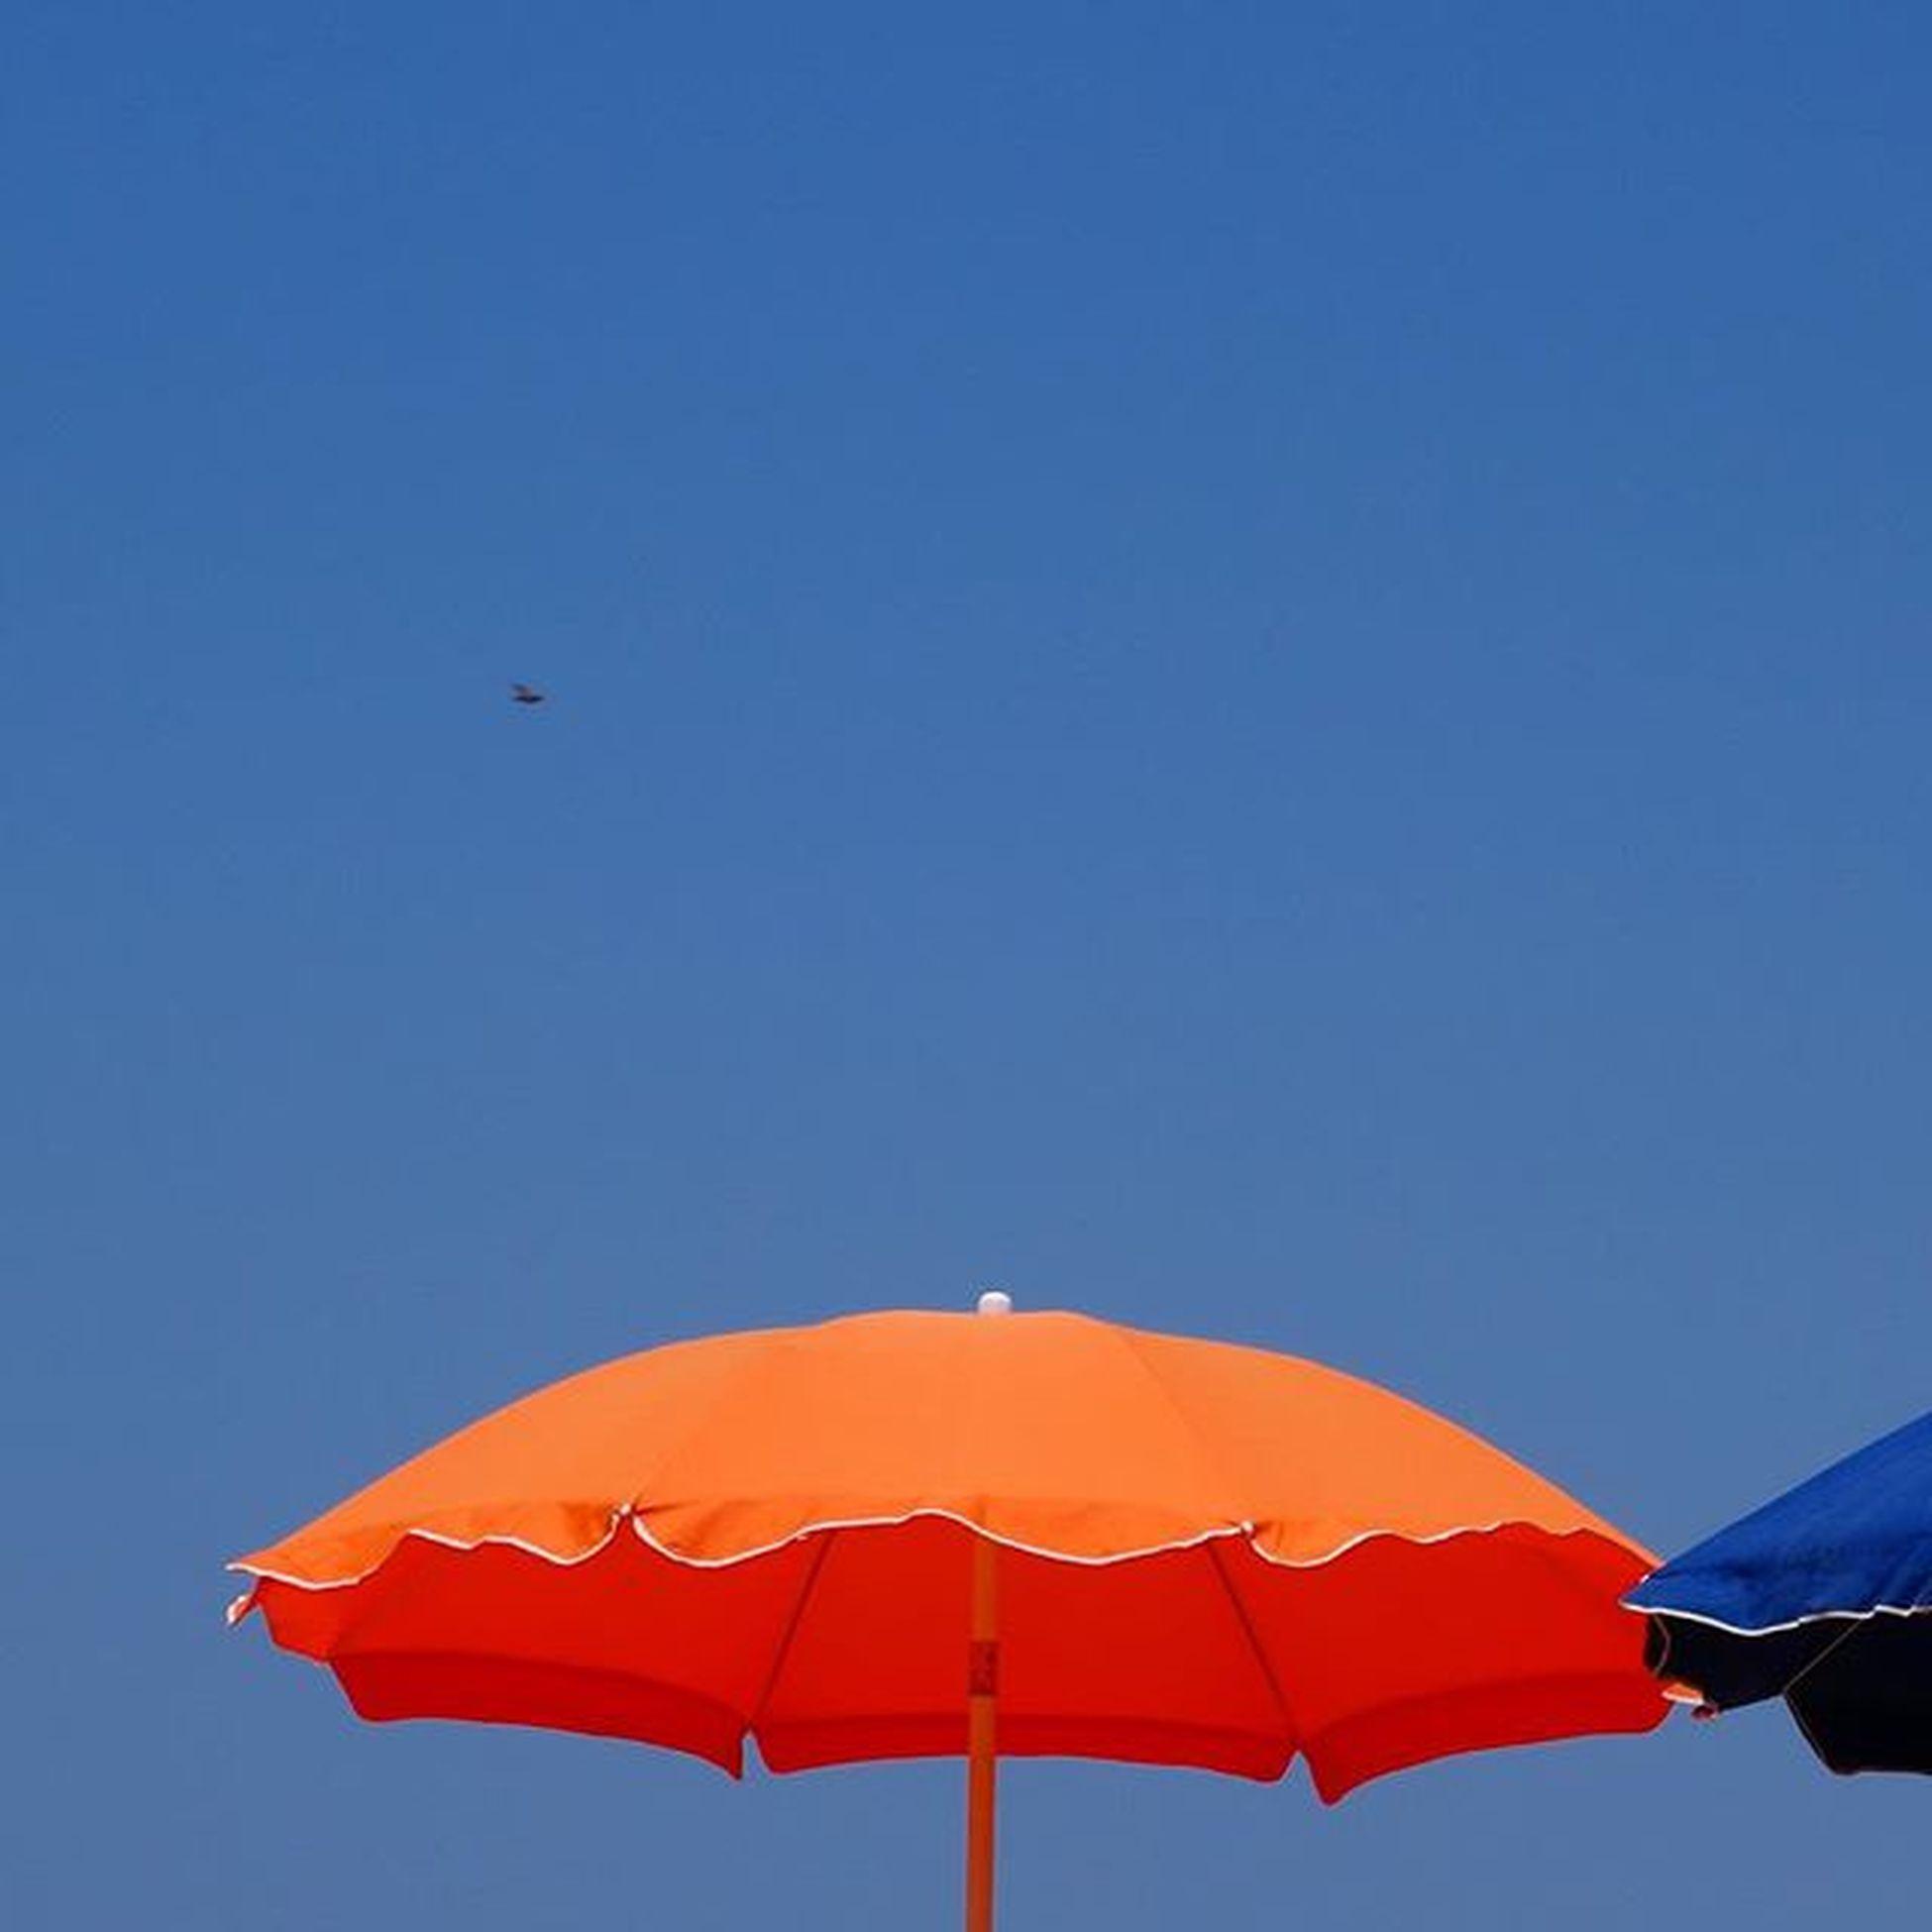 Time to relaxe under the sunset sun at Malta, beautiful 'San Blas Bay' together with @engelszunge. Carried there by @flyswiss - my personally most liked European airline. Visitmalta @visitmalta Malta Beach Beachday Beachlife Holidays Igersmalta Flyinginstagramers Flyingigers Igersaustria Lovedailydose Dailydose Sunnyday Daytorelaxe Rkoi Sunpower Summertime Summerfeeling Sunrisebeach Summerholdiday In